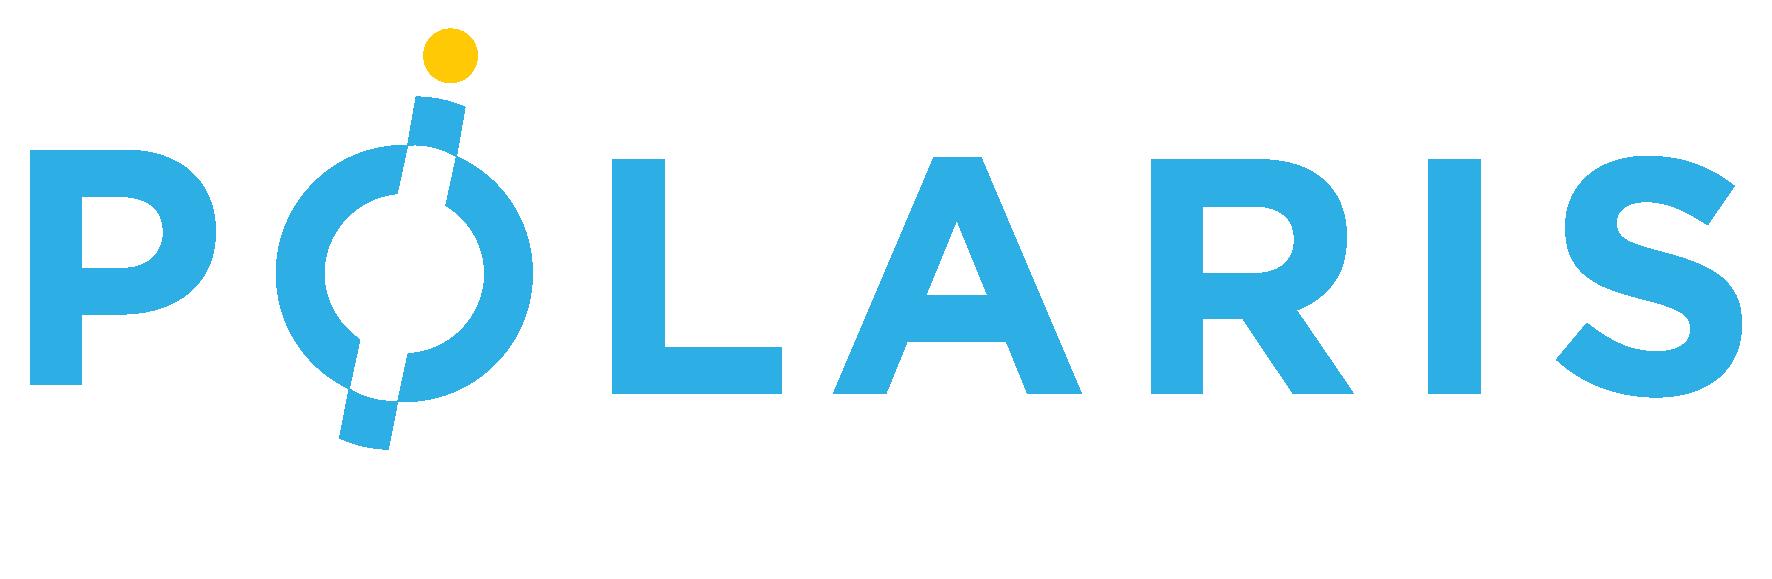 Additional minor tweaks to Polaris logo.